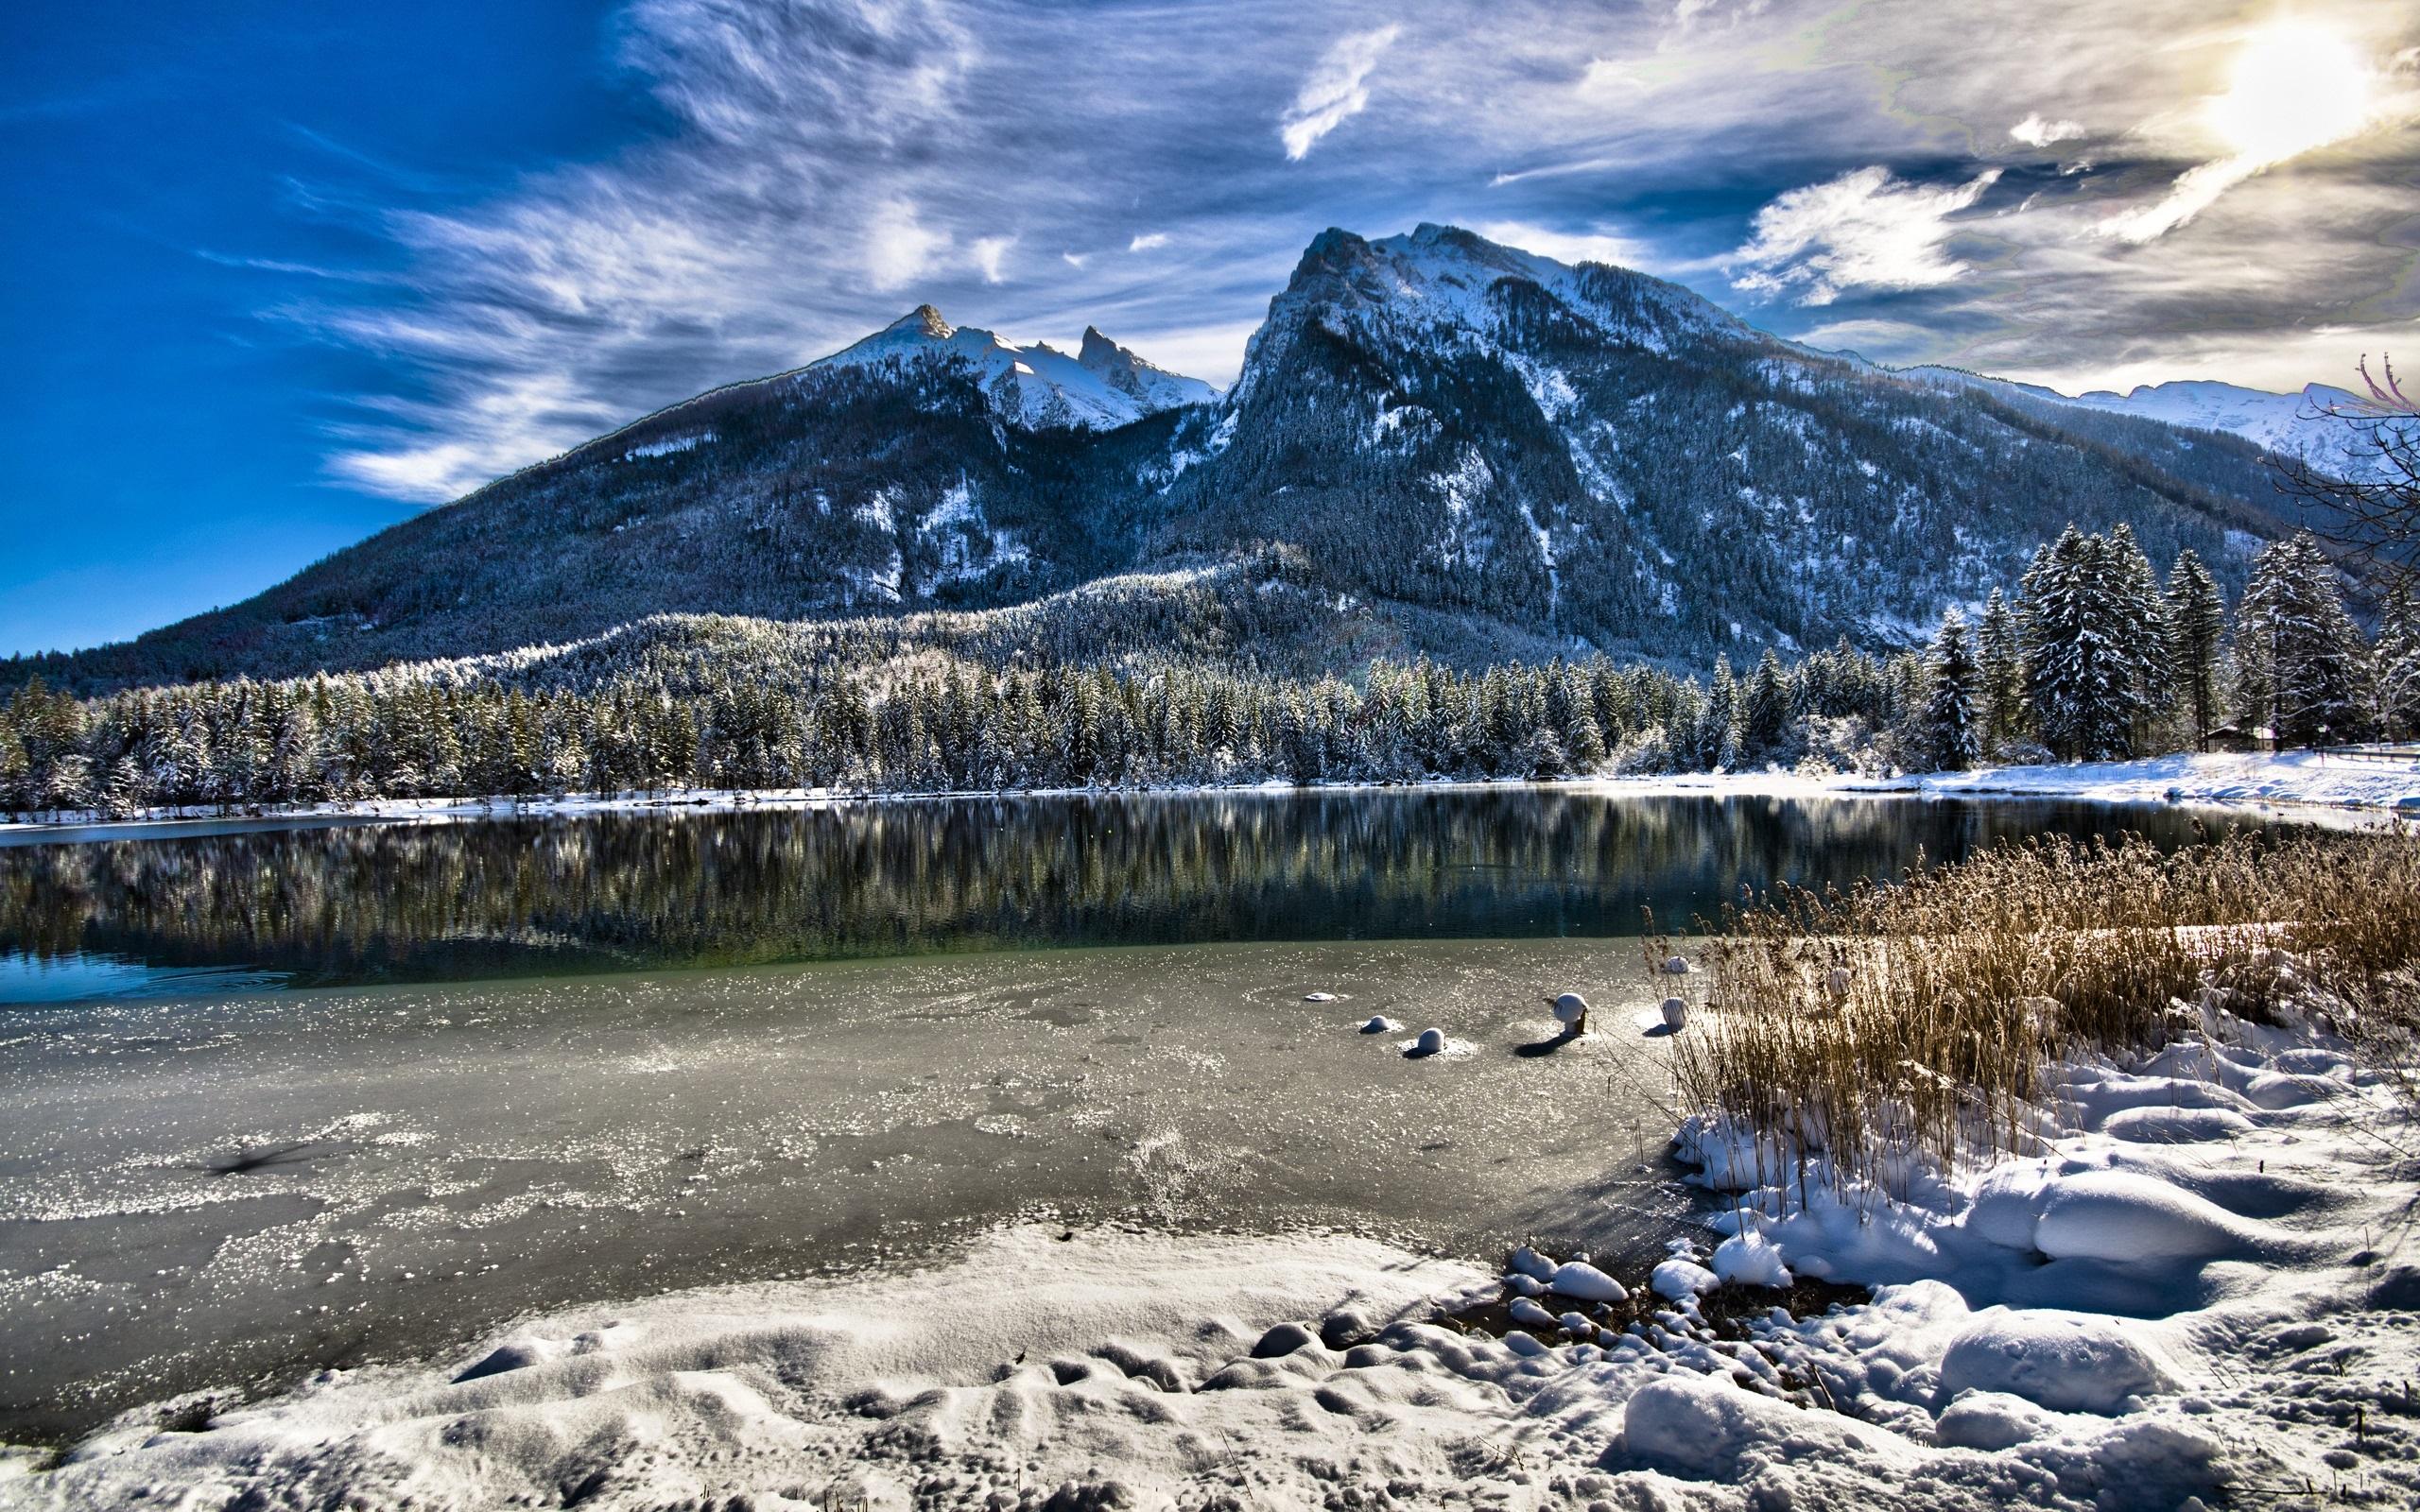 Montaña Nevada Hd: Fondos De Pantalla Baviera, Alemania, Lago, árboles